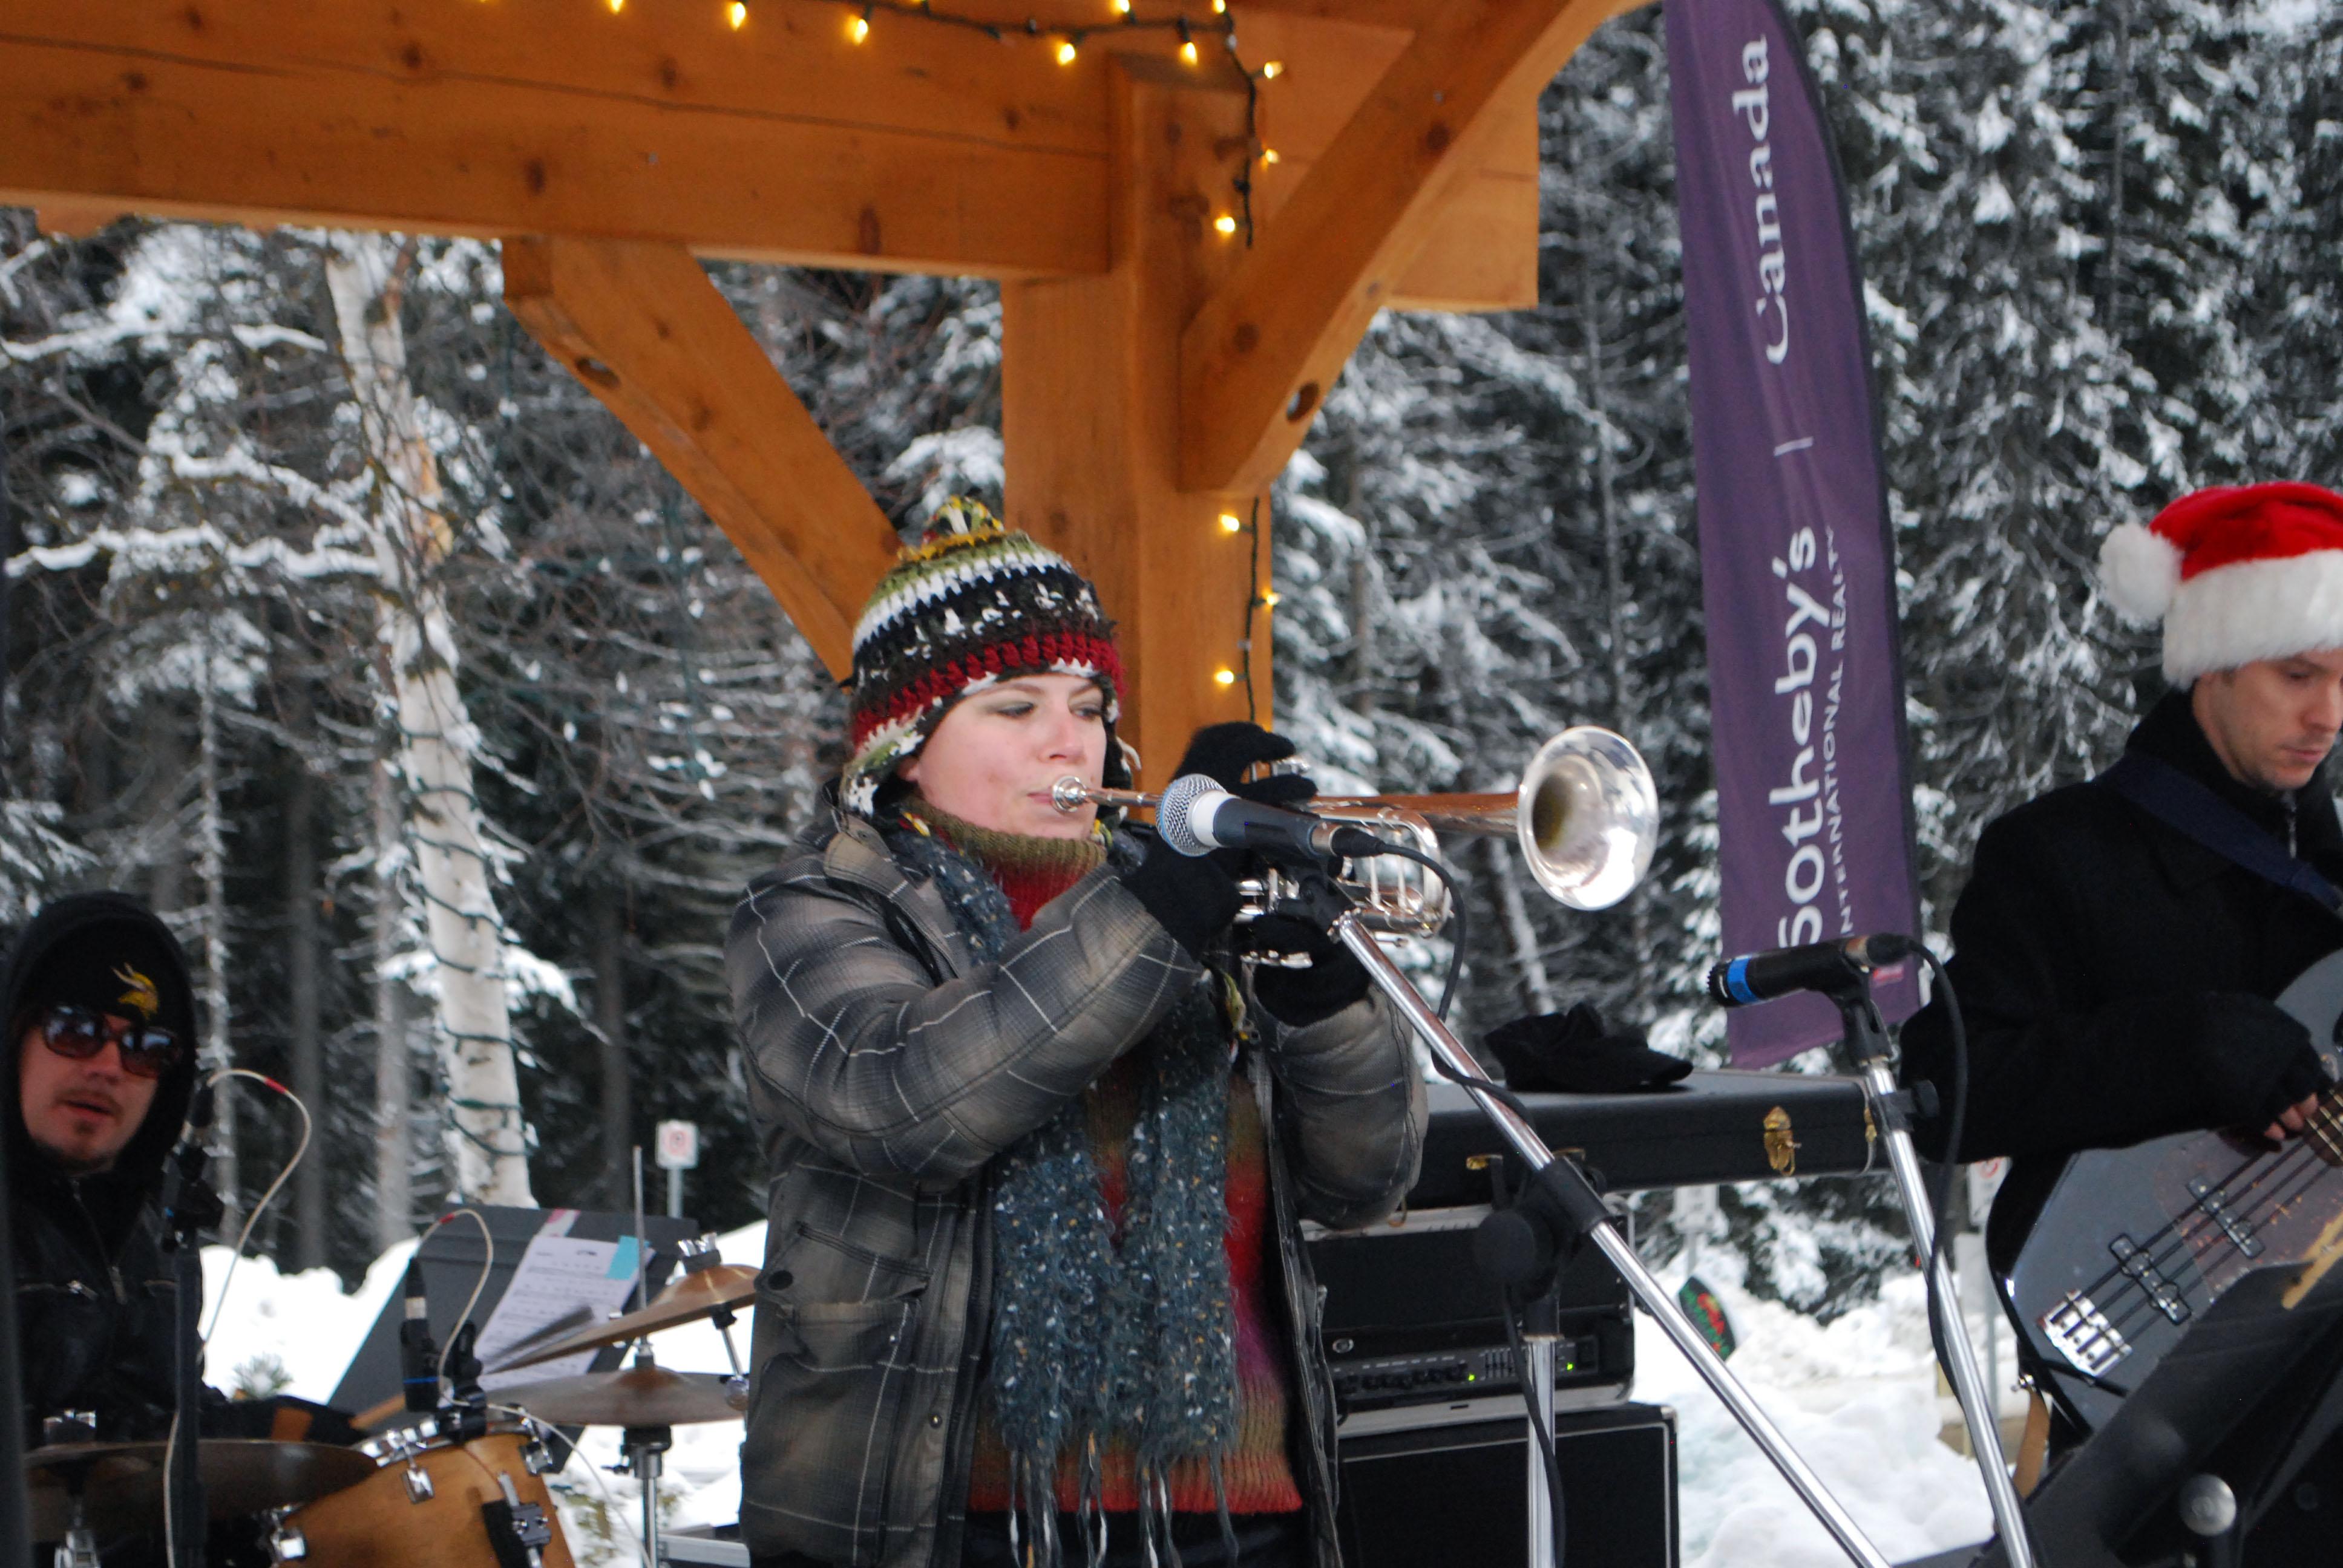 The Anita Eccleston quartet provided musical entertainment during Santa's visit.